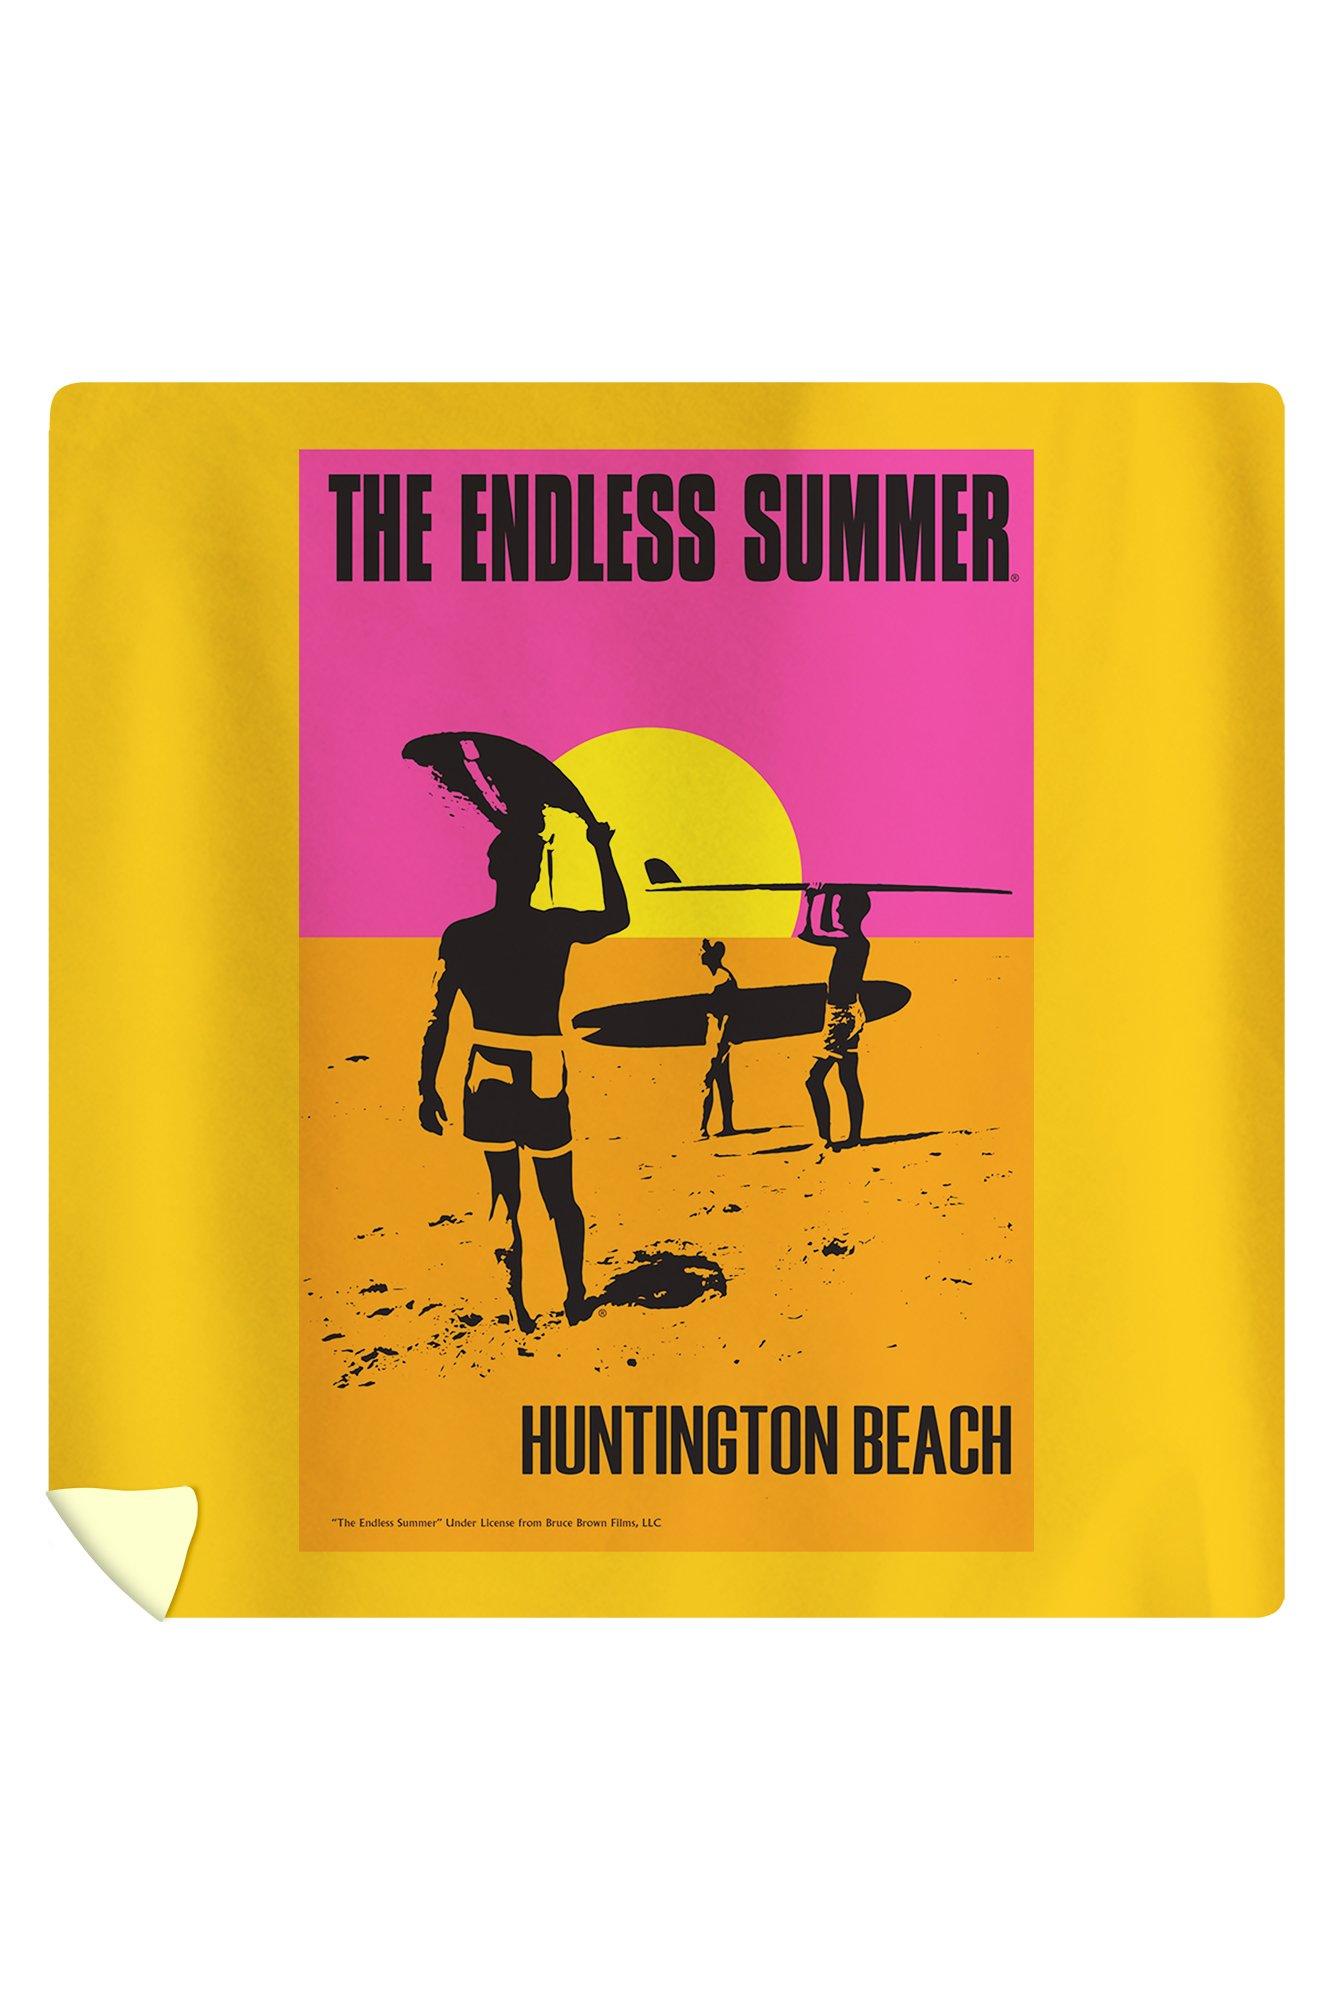 Huntington Beach, California - The Endless Summer - Original Movie Poster (88x88 Queen Microfiber Duvet Cover)